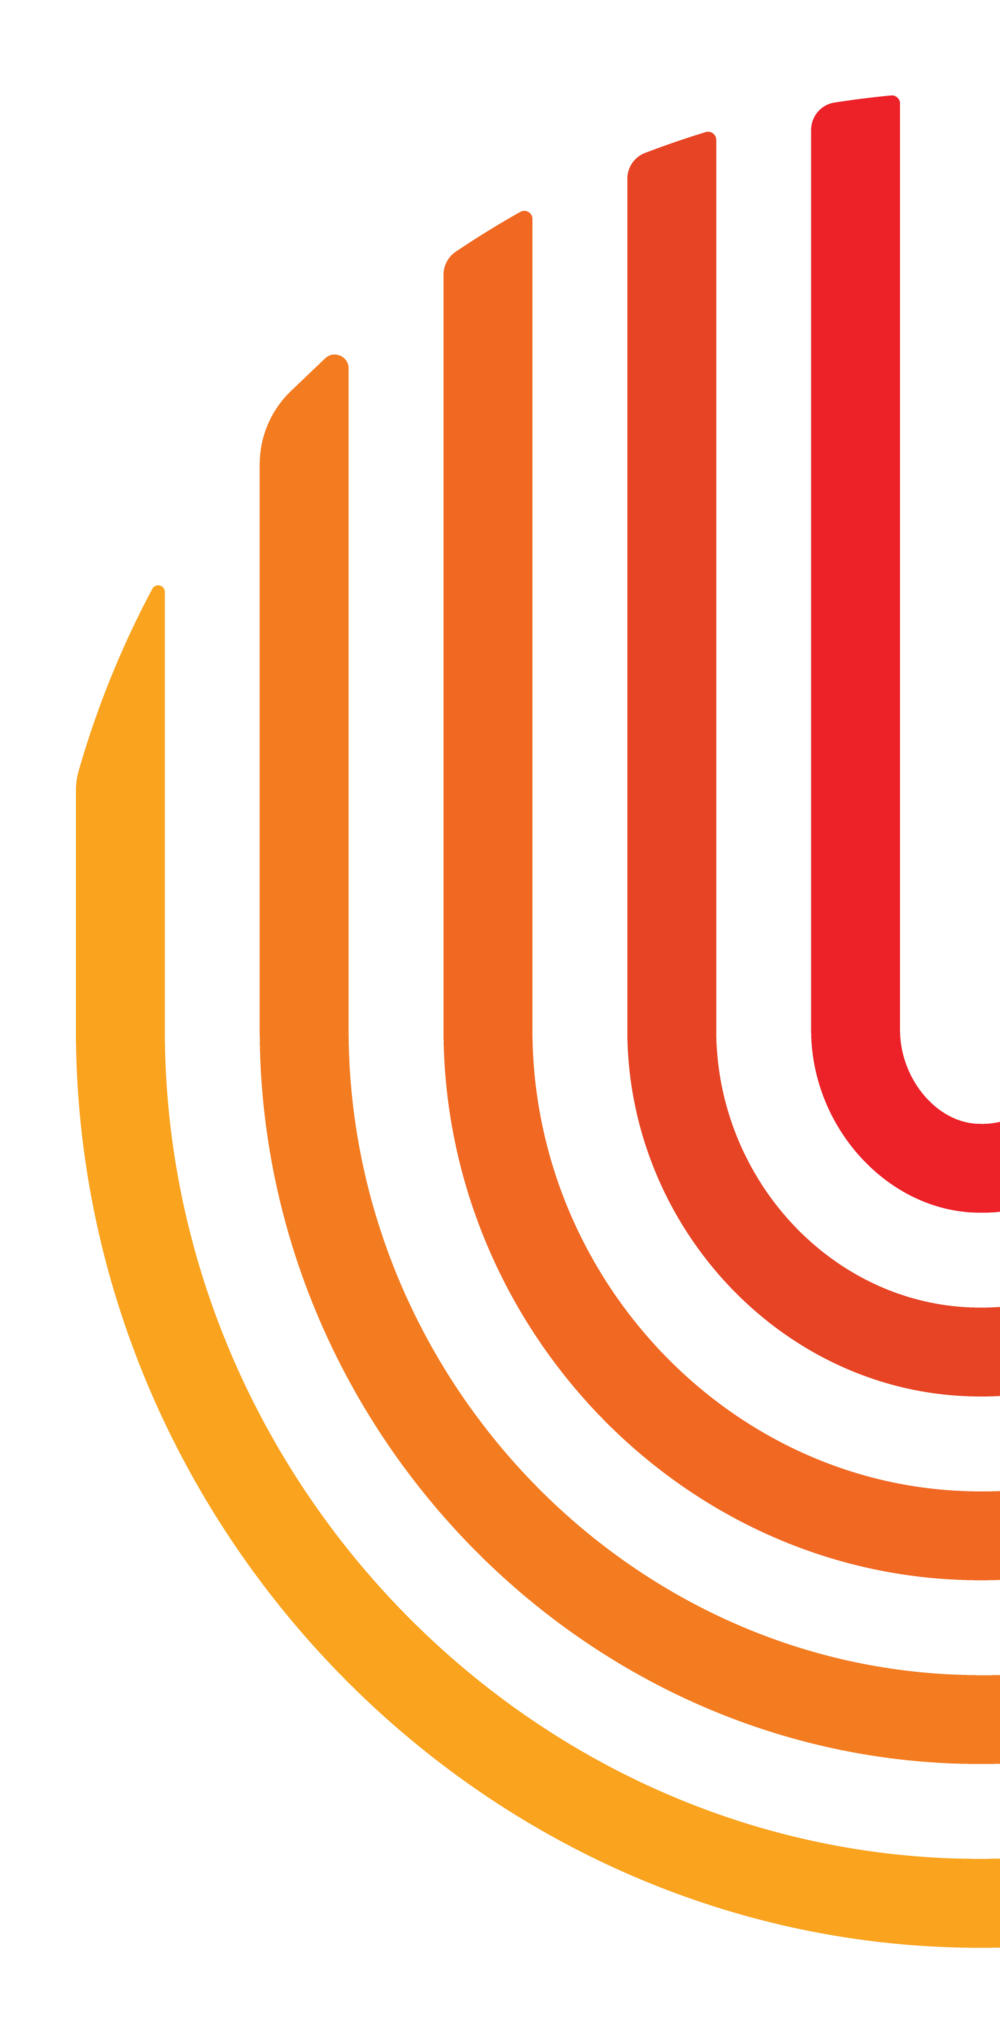 WUF_logomark-2png-06.png